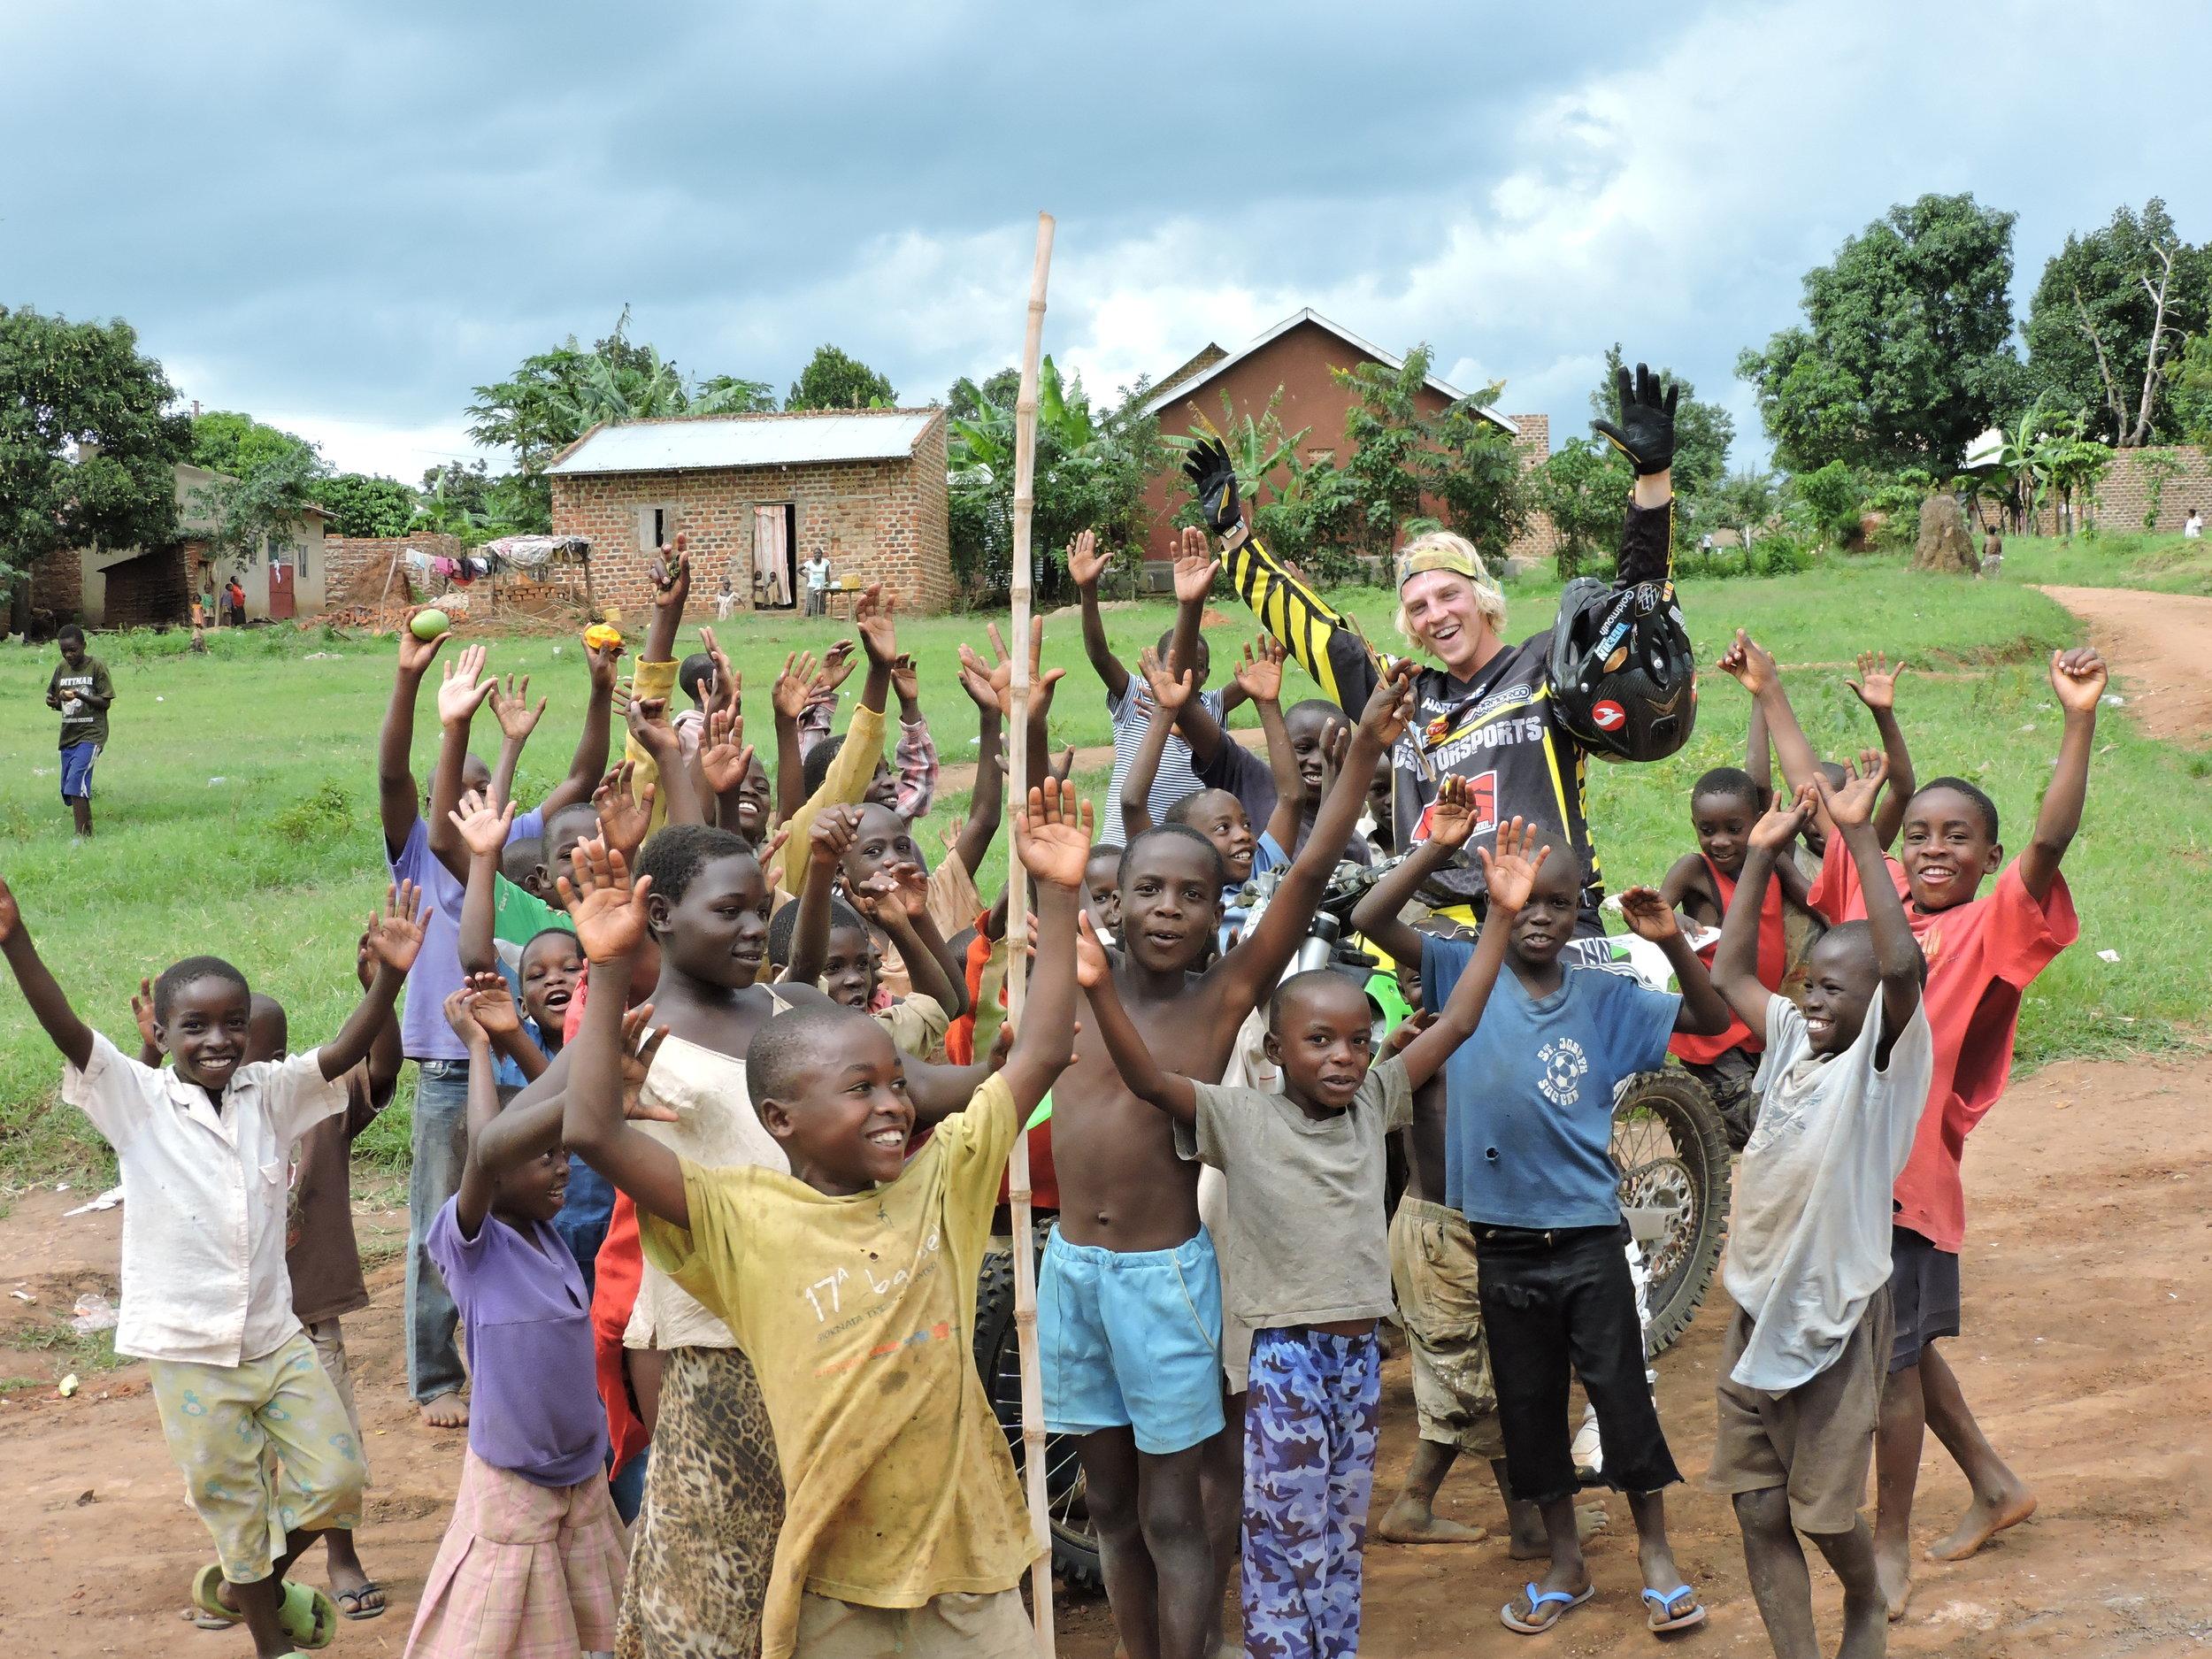 Daniel Sedlak making new friends while teaching Motocross and Enduro lessons in Uganda Africa